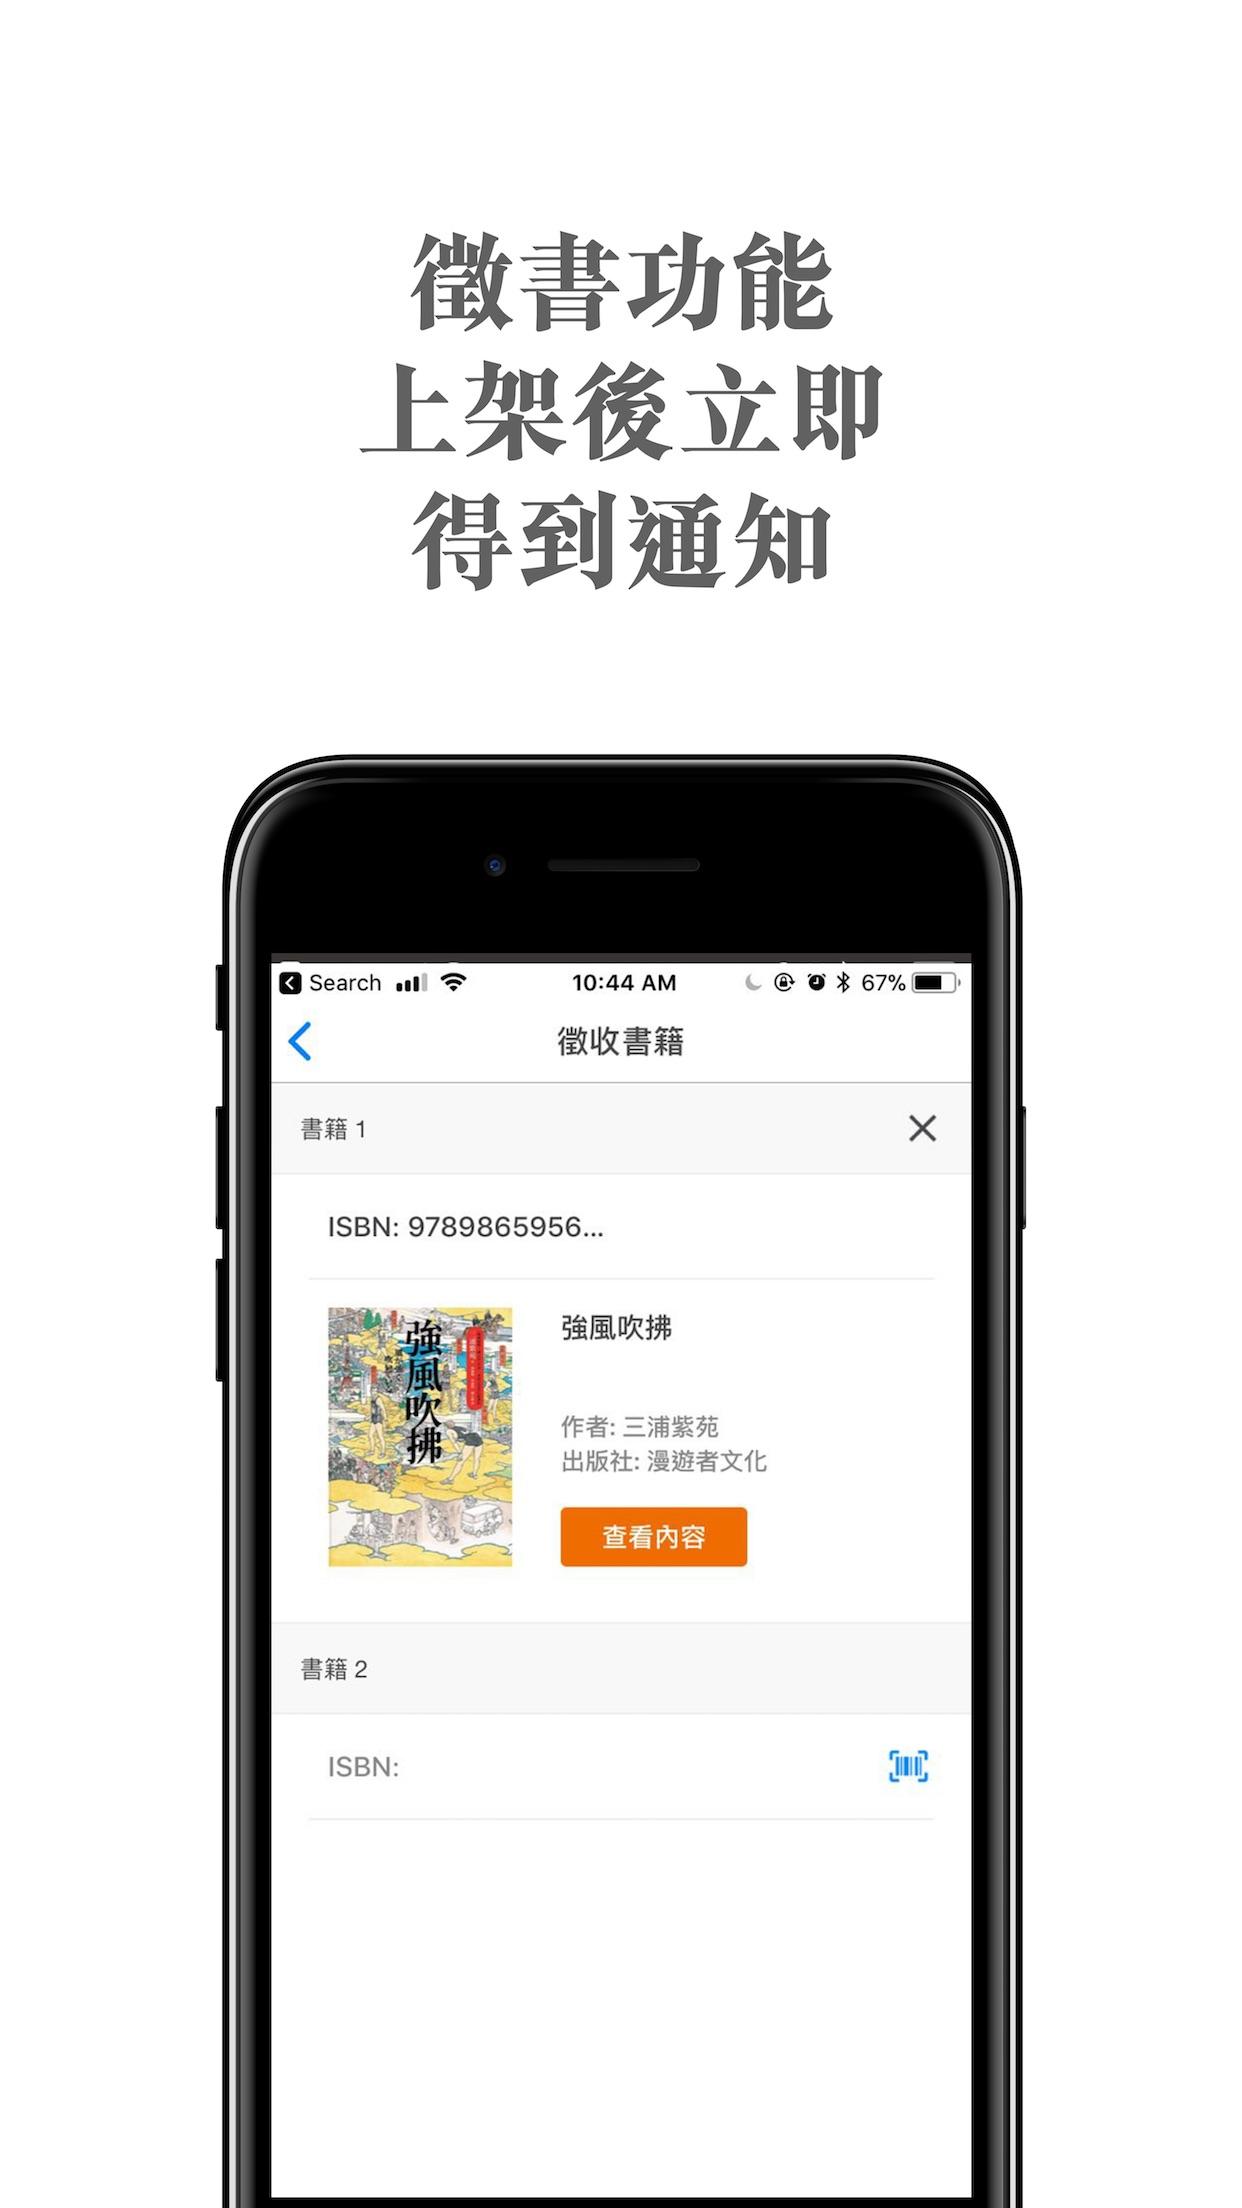 Sparktake  二手書買賣及閱讀分享平台 Screenshot